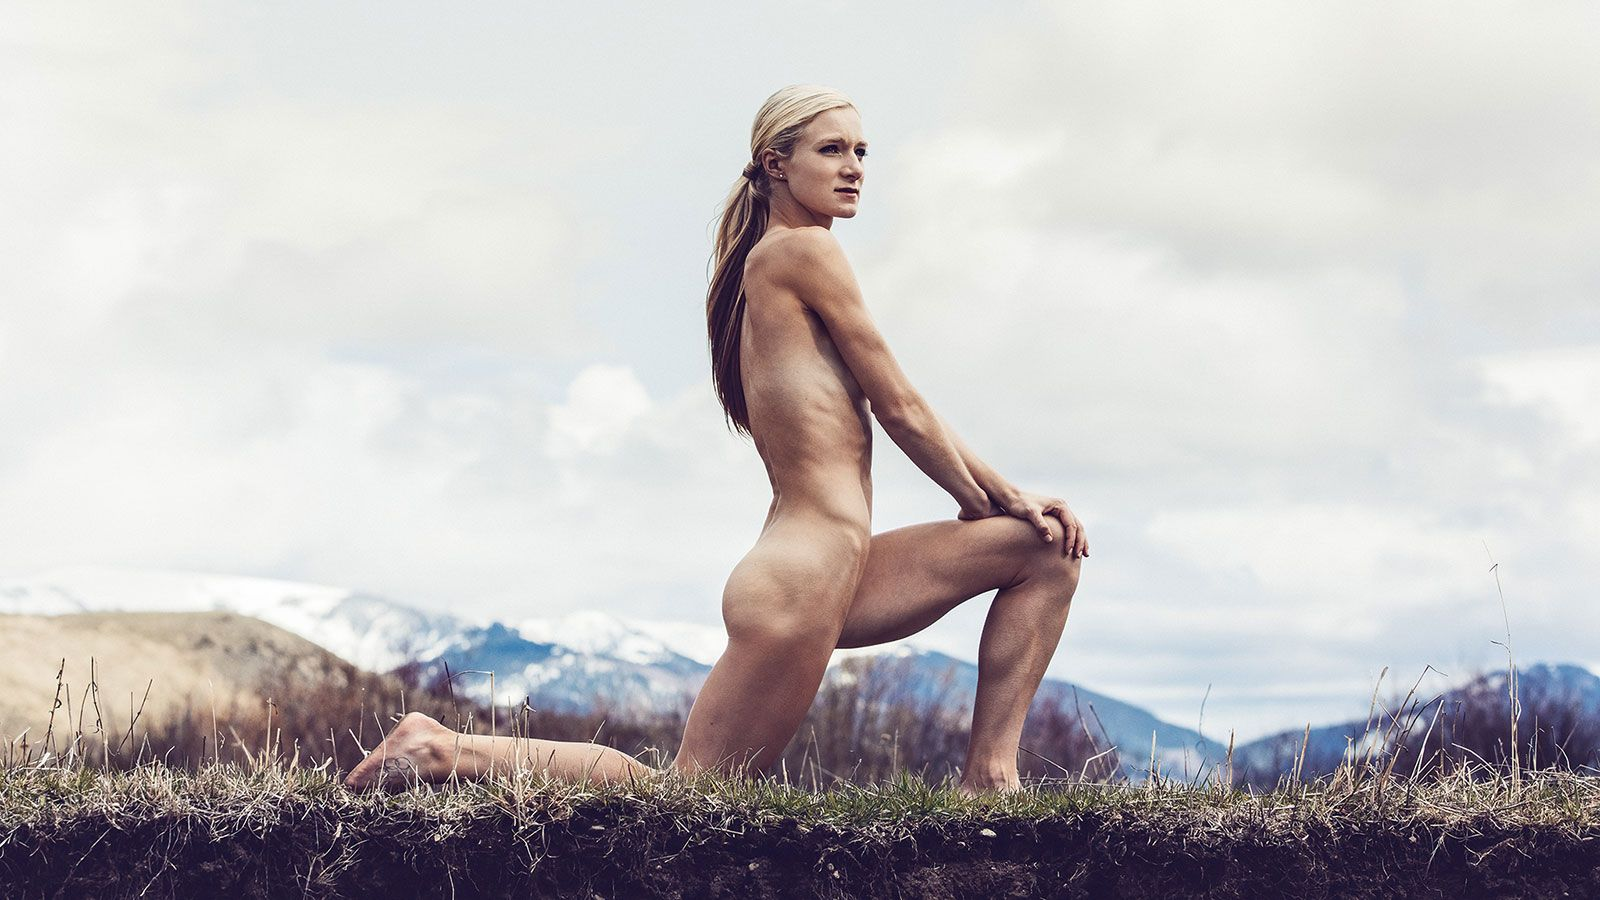 Femmes d'espn nude